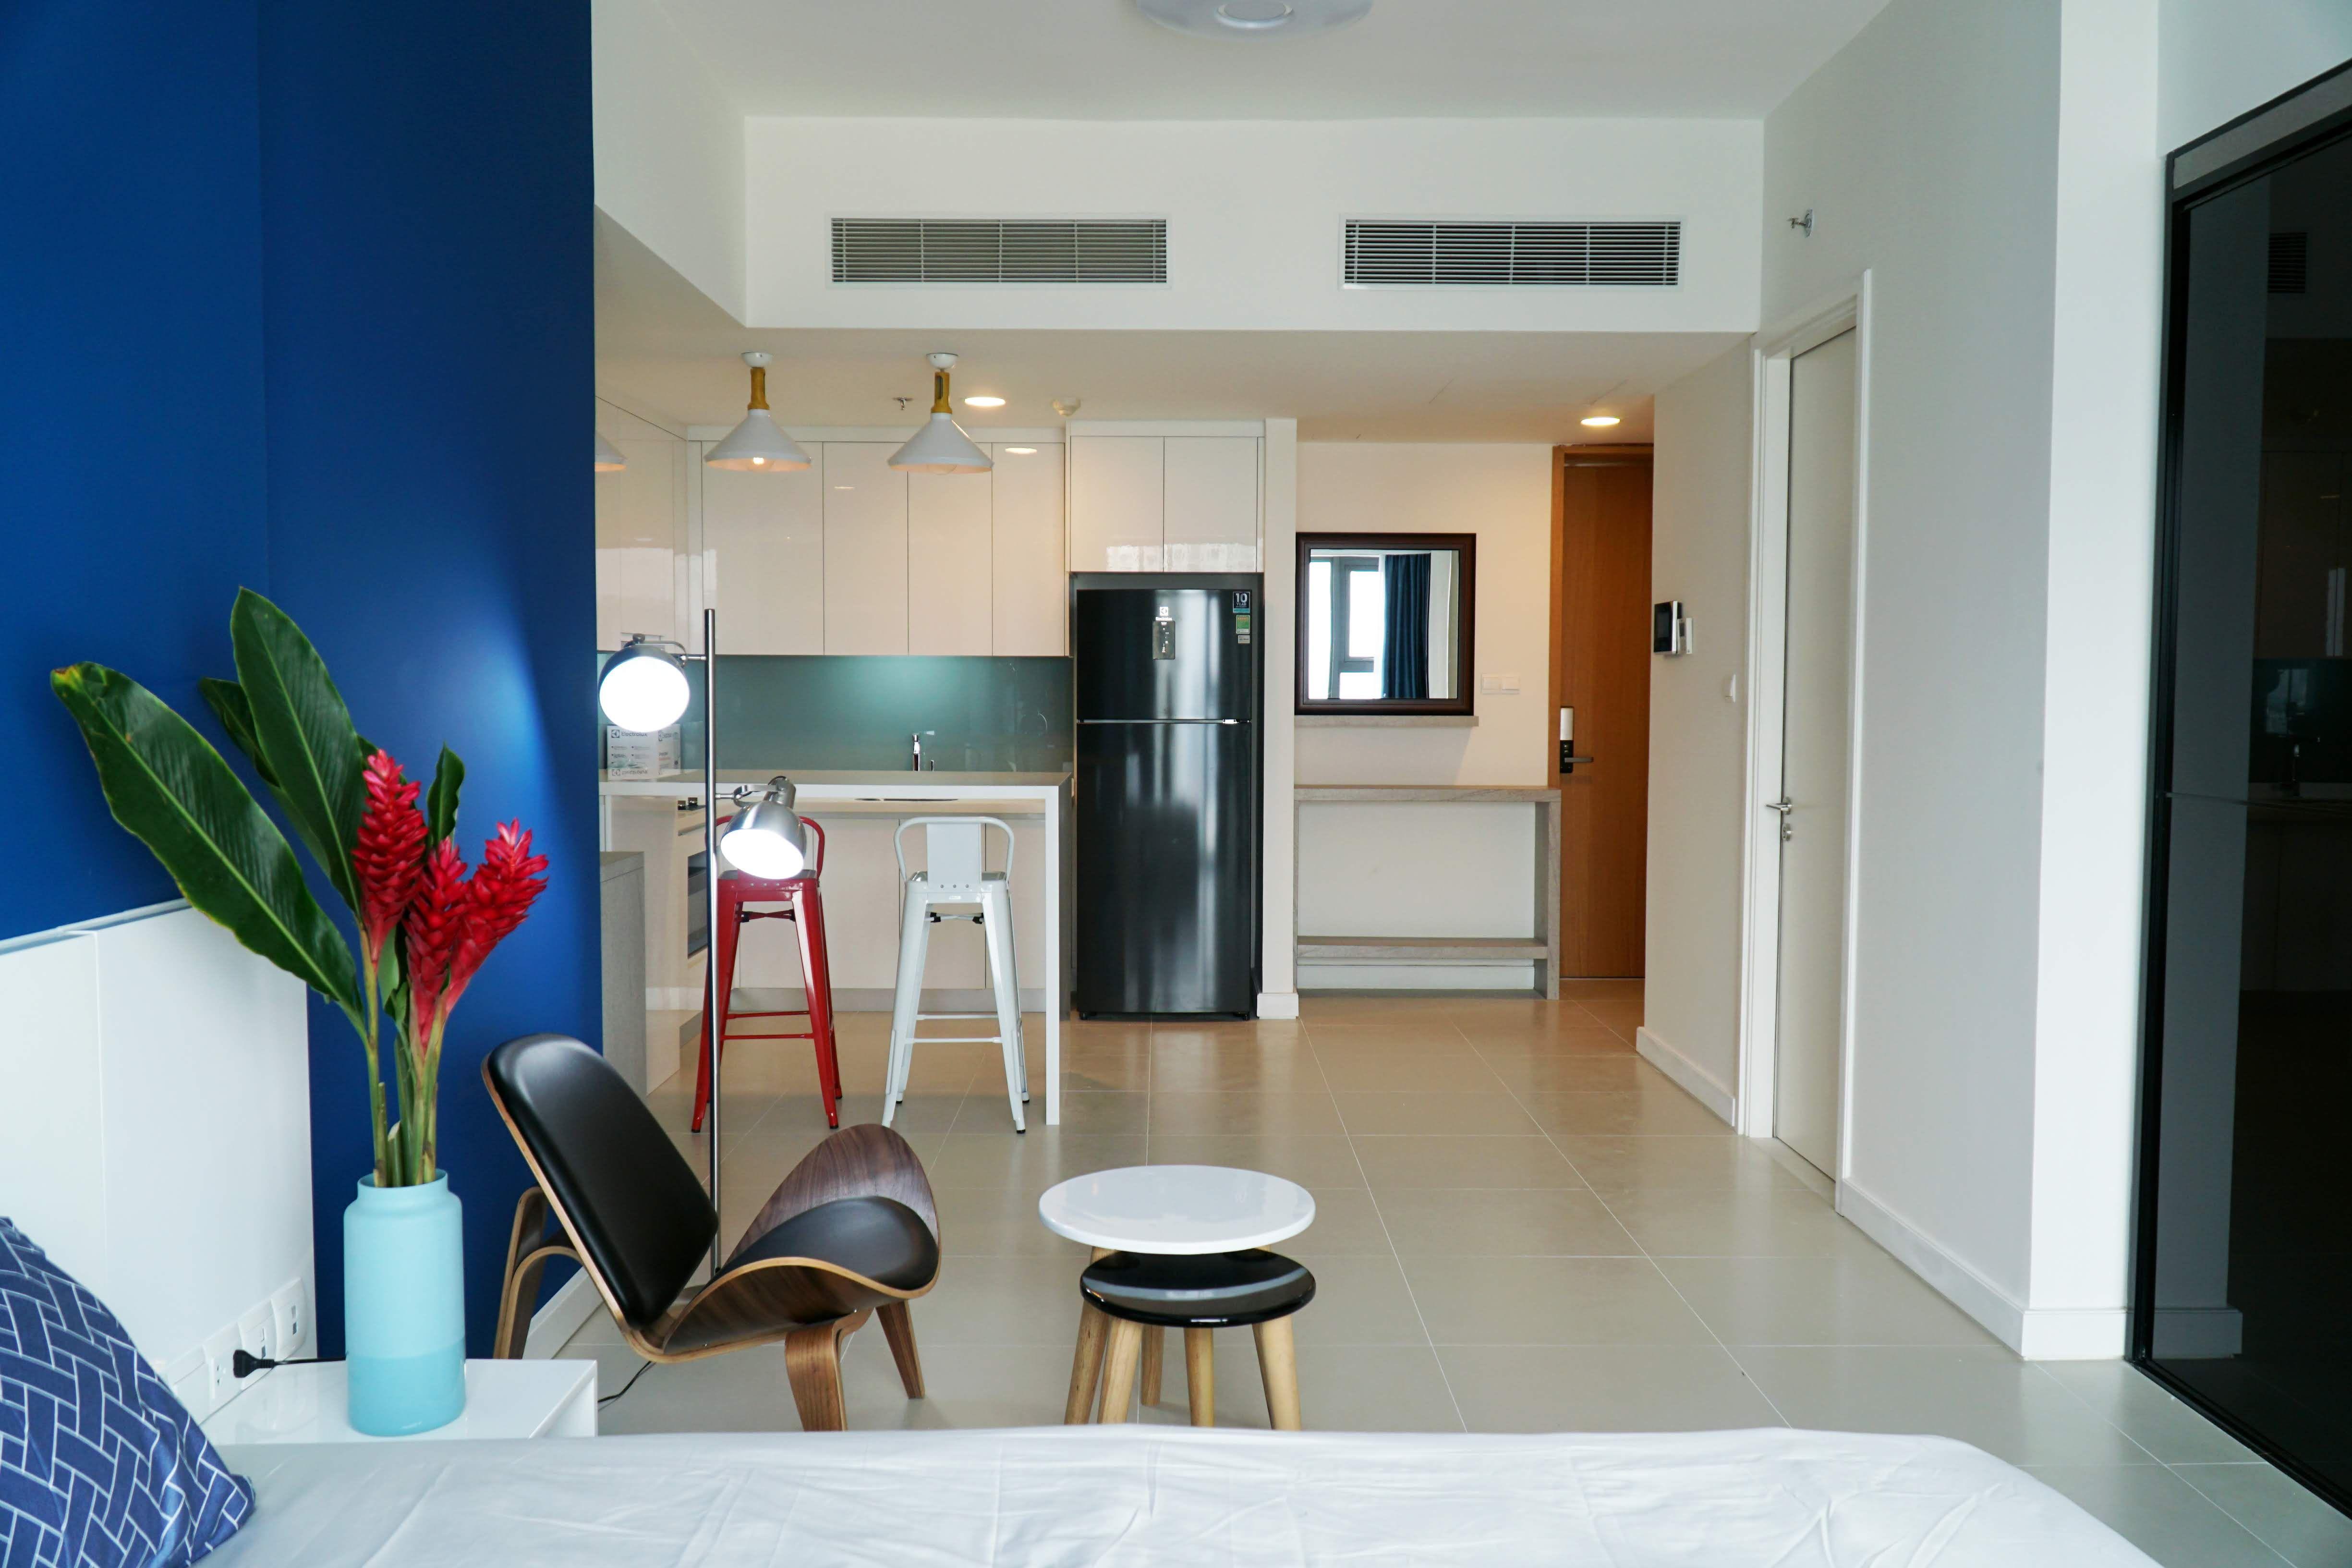 Gateway Thao Dien Studio Apartment For Rent Fully Furnished High Floor Furnished Studio Apartments Apartments For Rent Studio Apartment